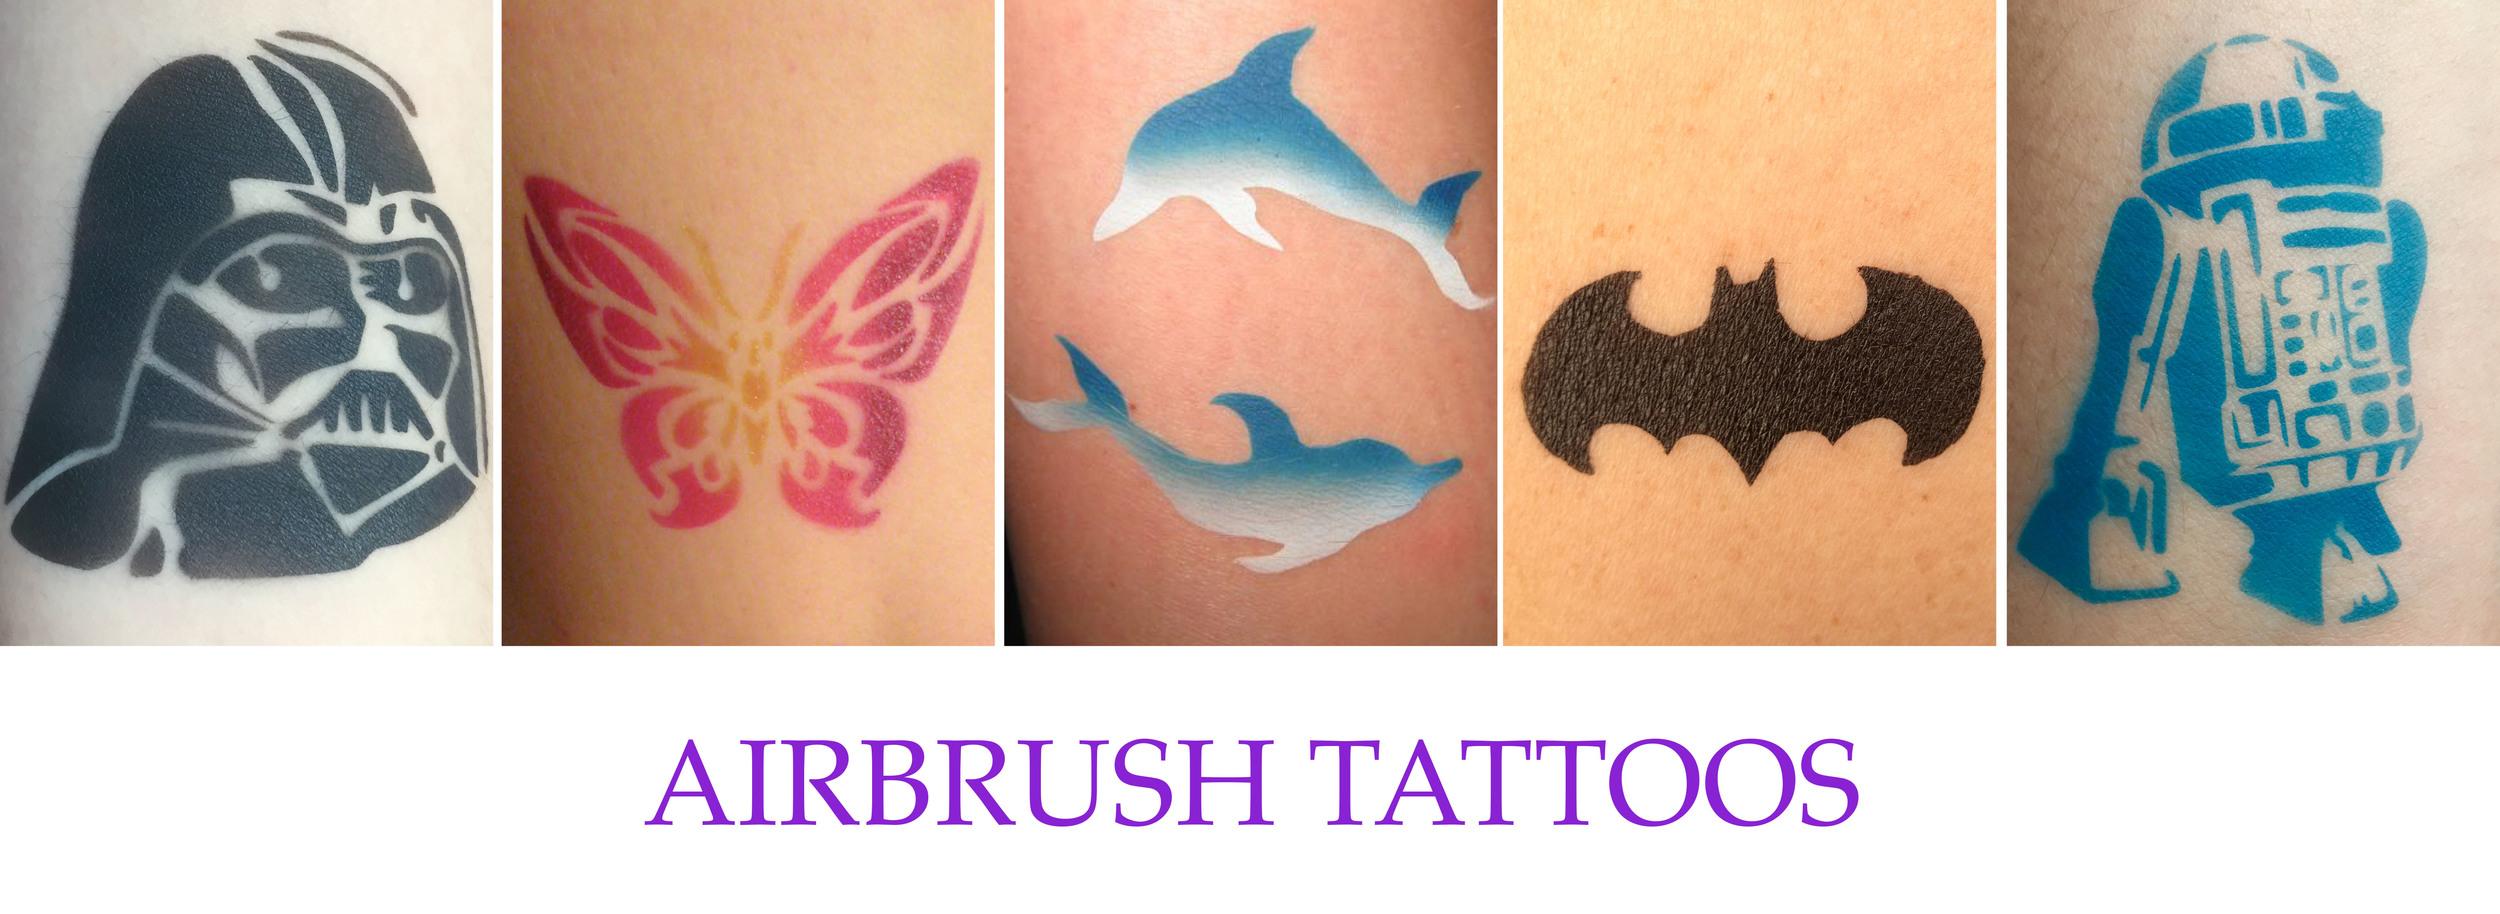 Airbrush Tattoos We Adorn You.jpg